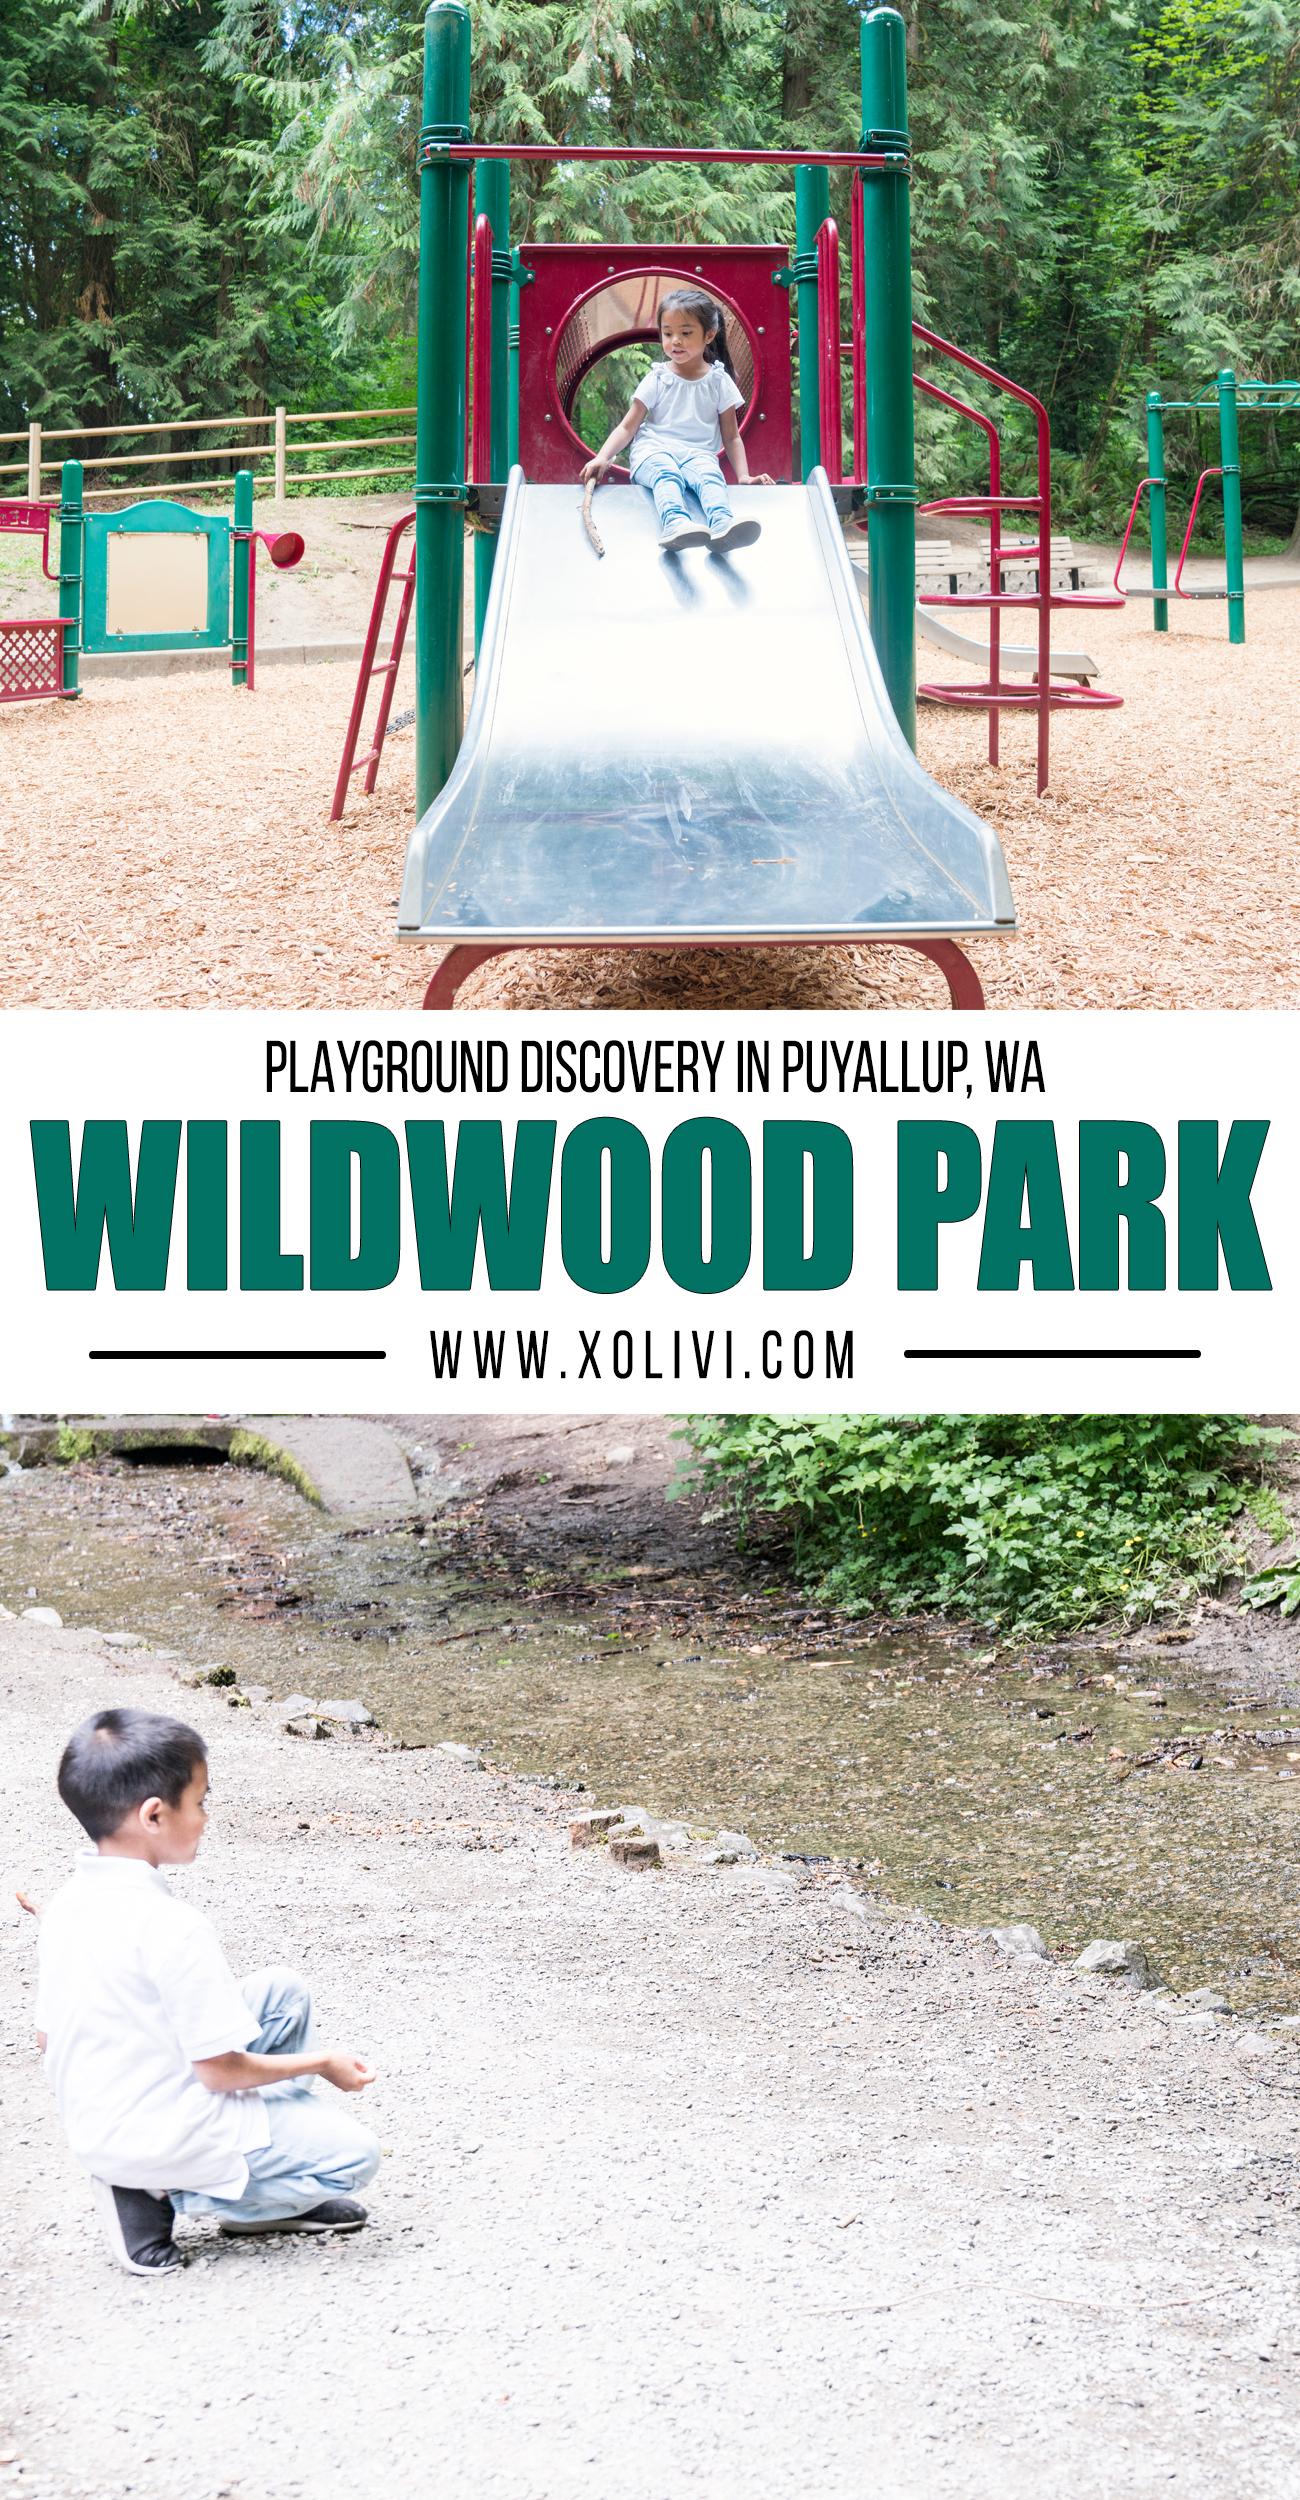 wildwood park puyallup washington